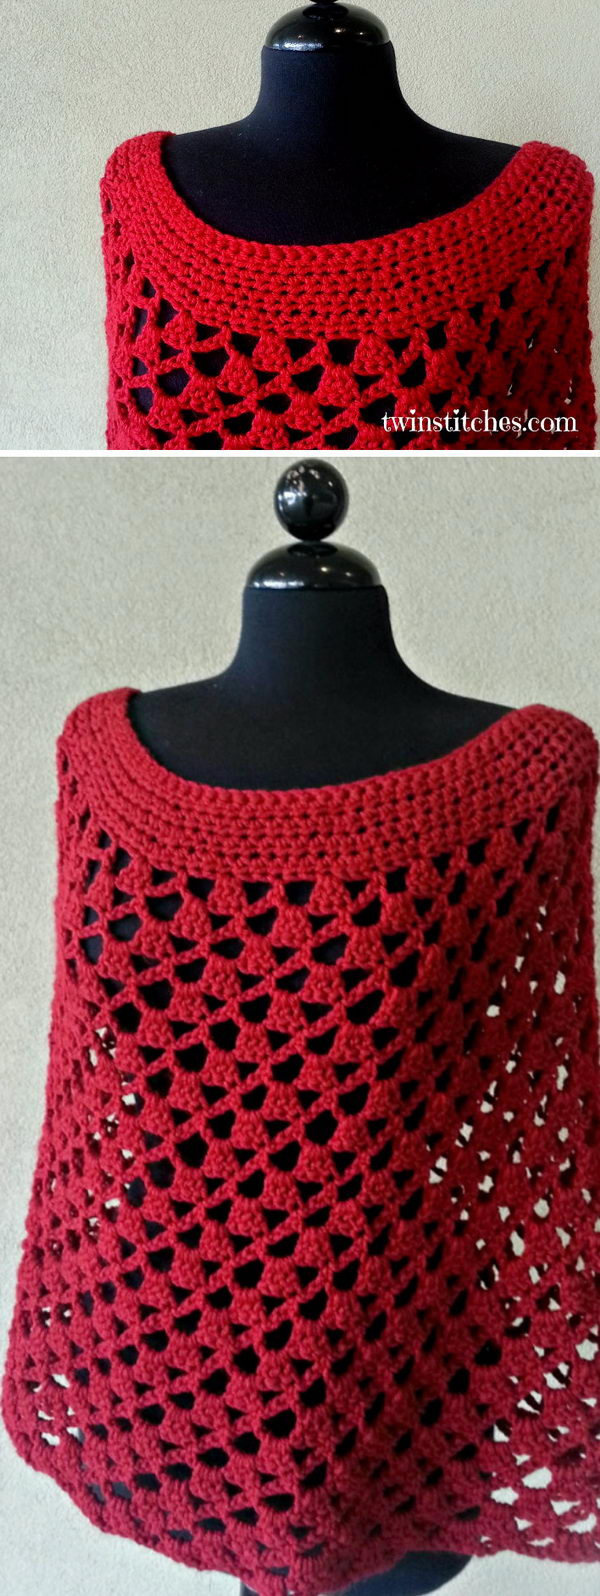 14 crochet women capes poncho ideas - 20 Crochet Women Capes and Poncho Ideas